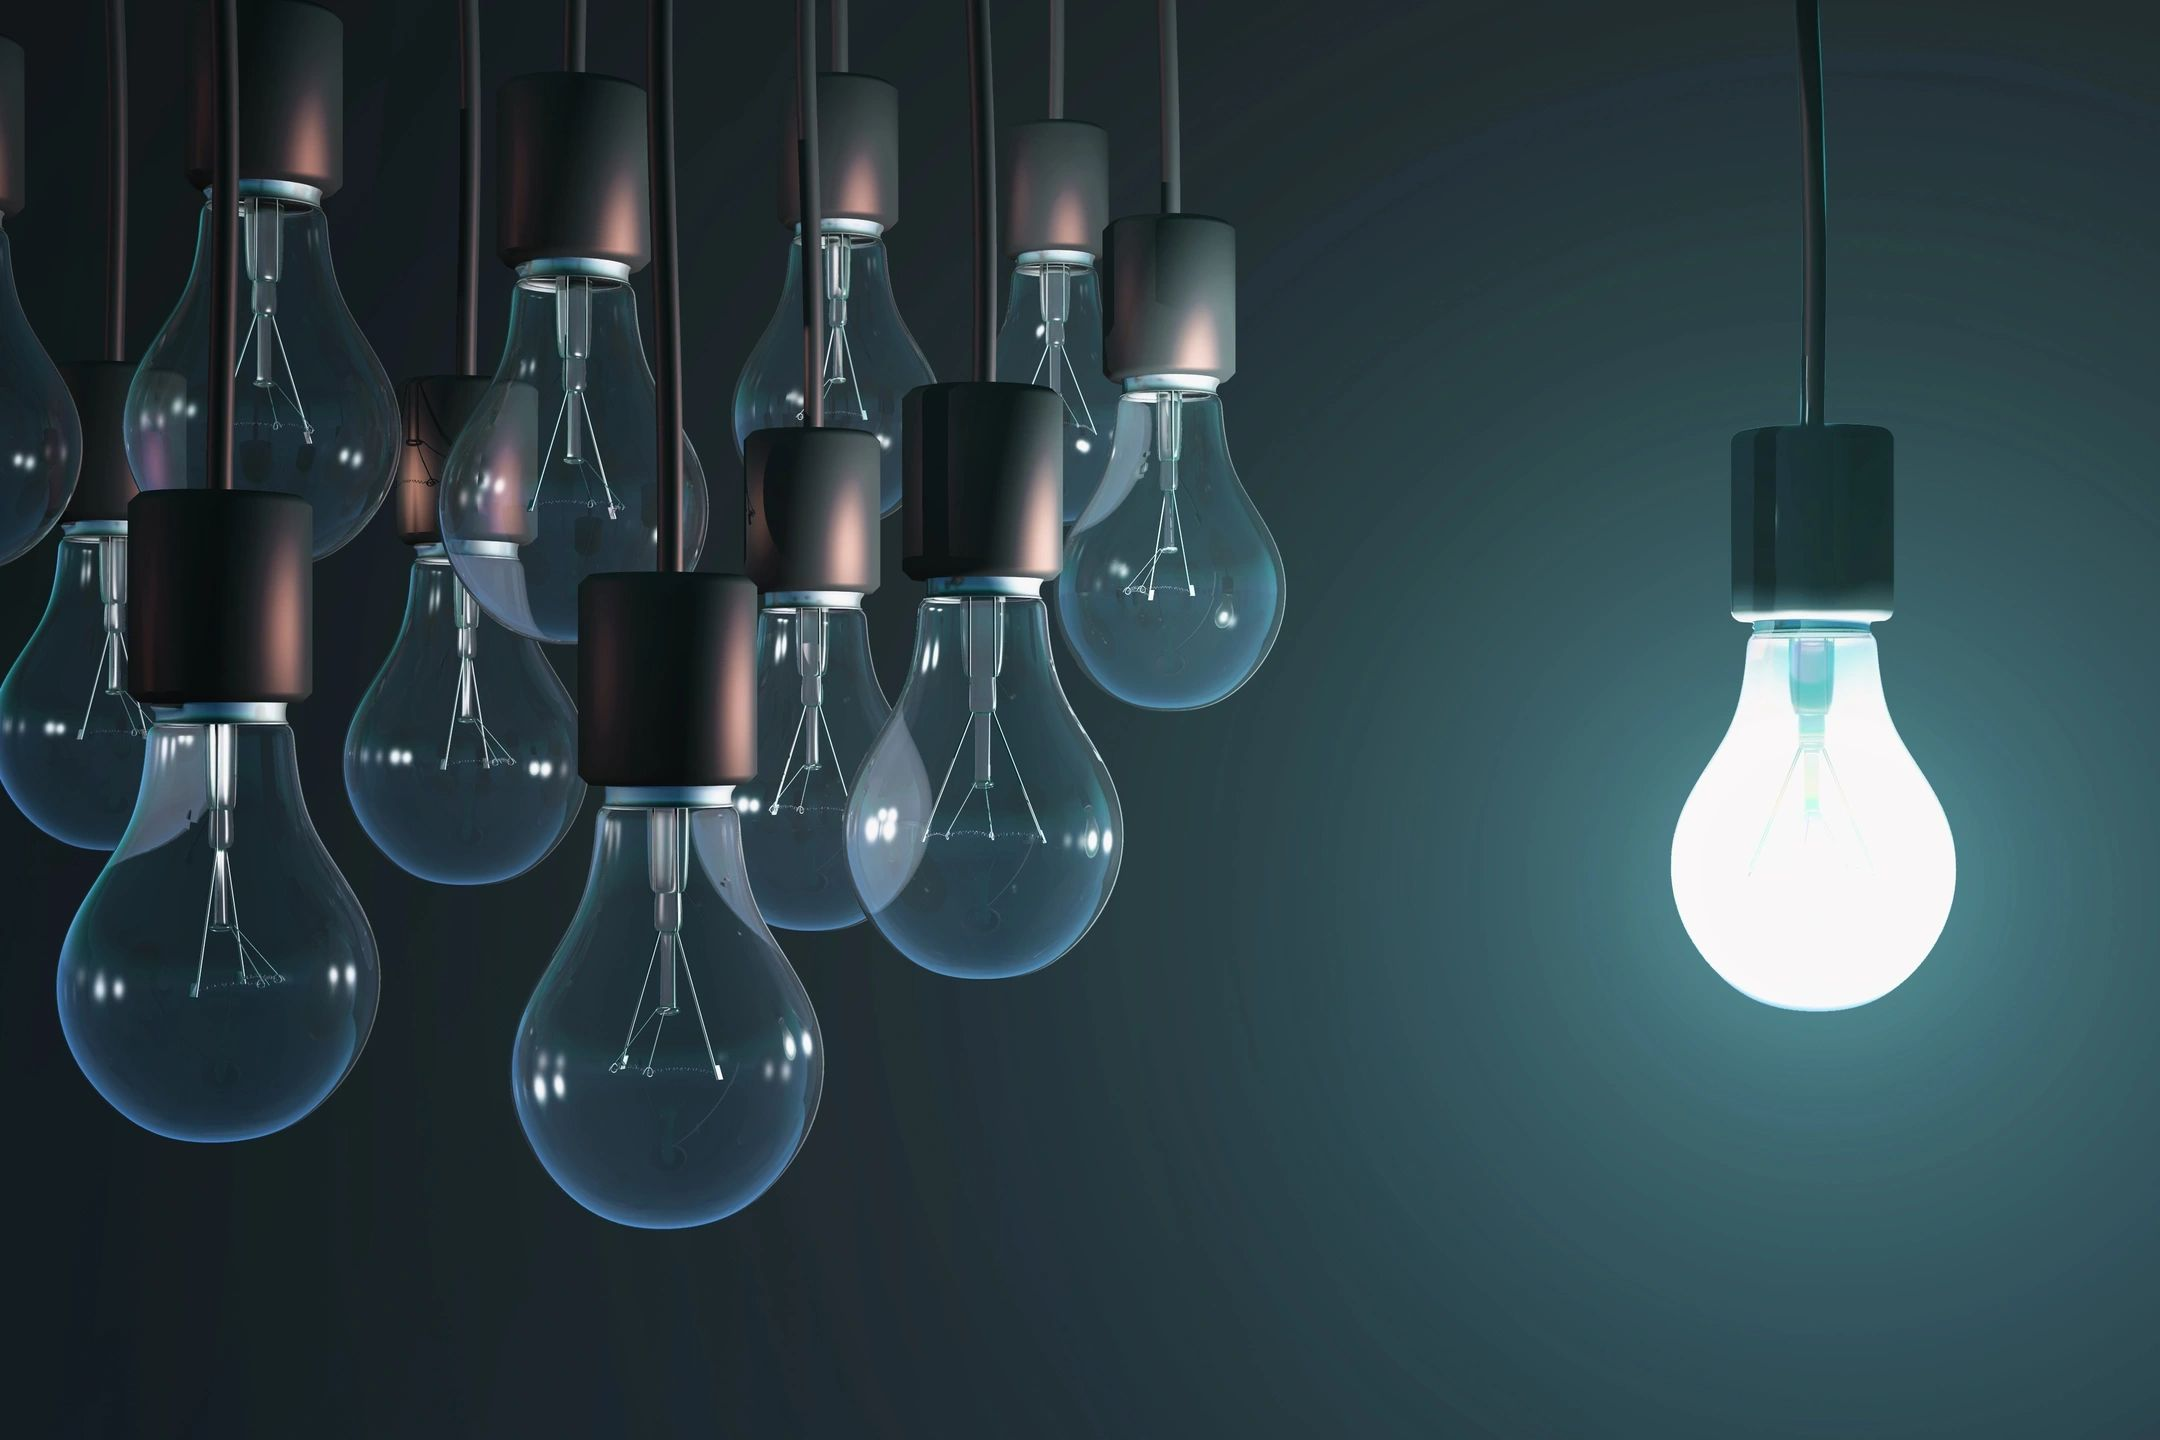 Graphic of a single illuminated lightbulb